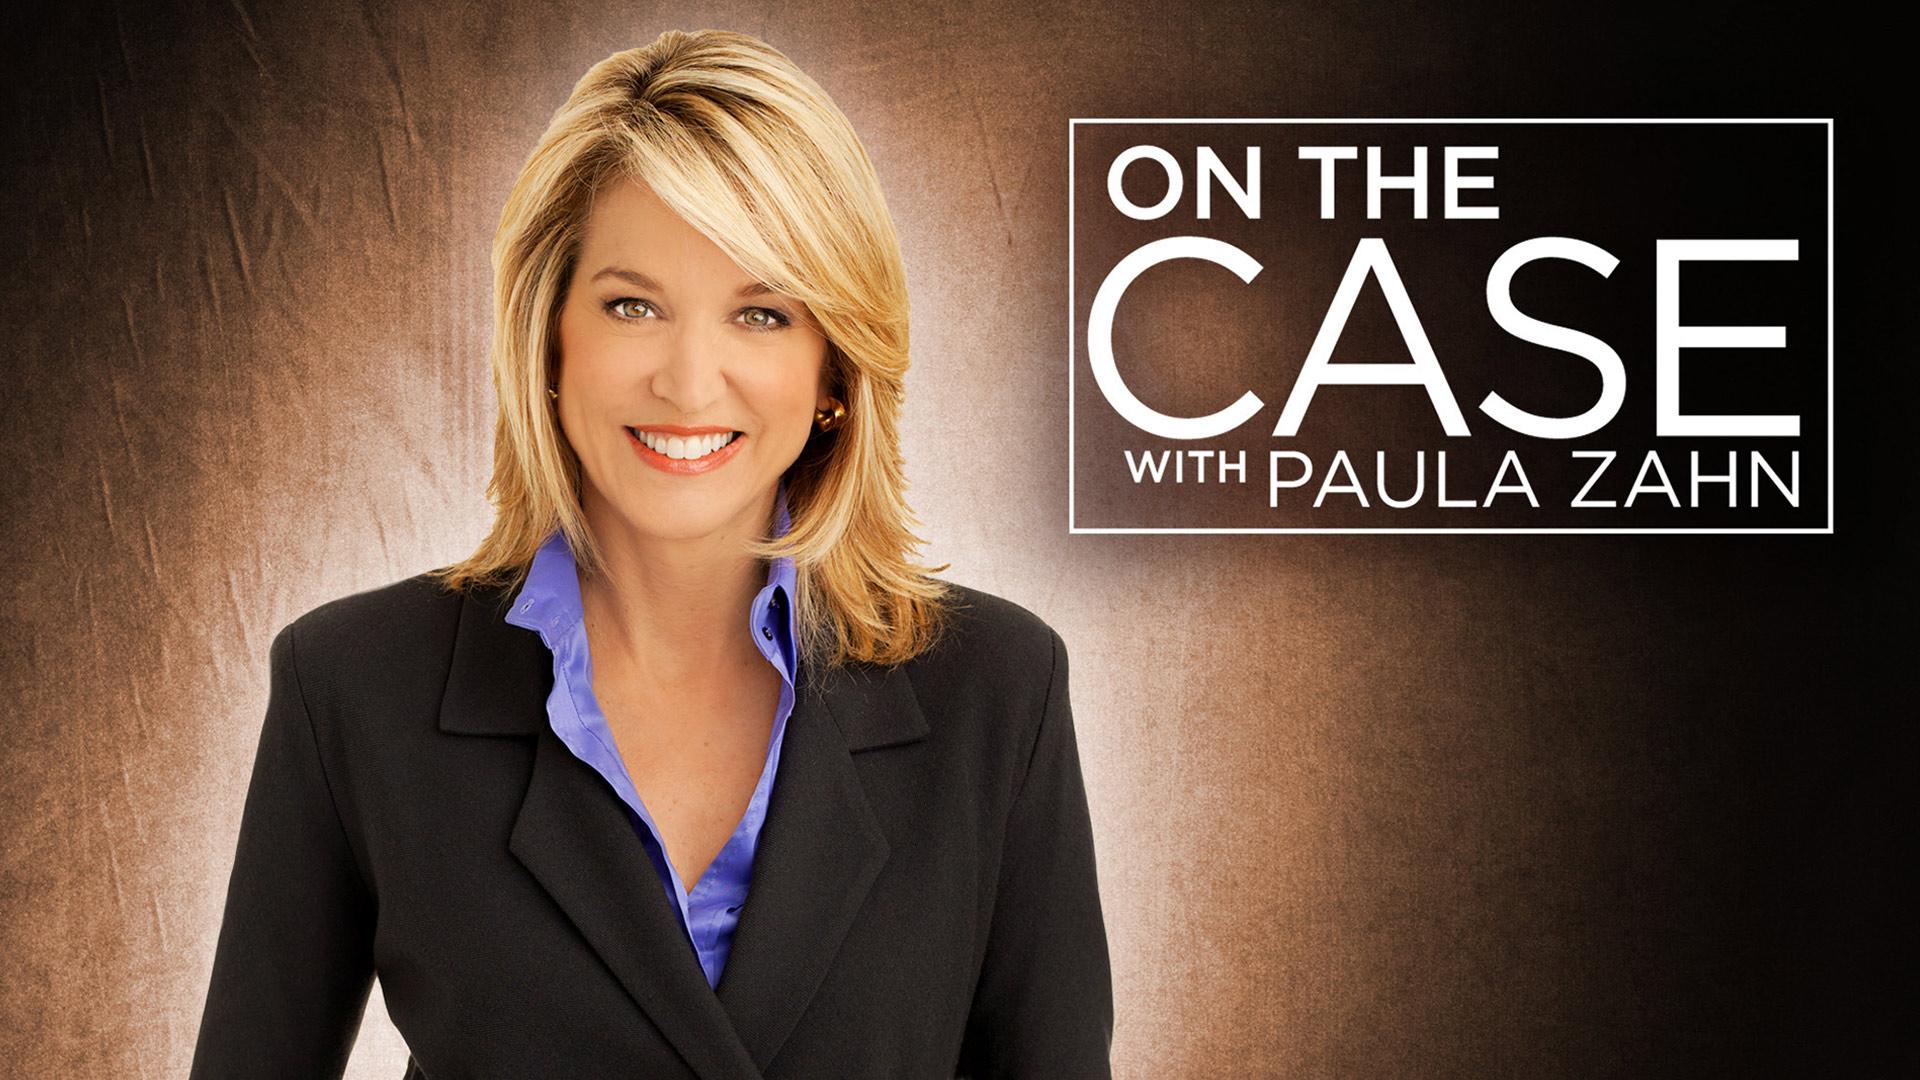 On the Case with Paula Zahn Season 1